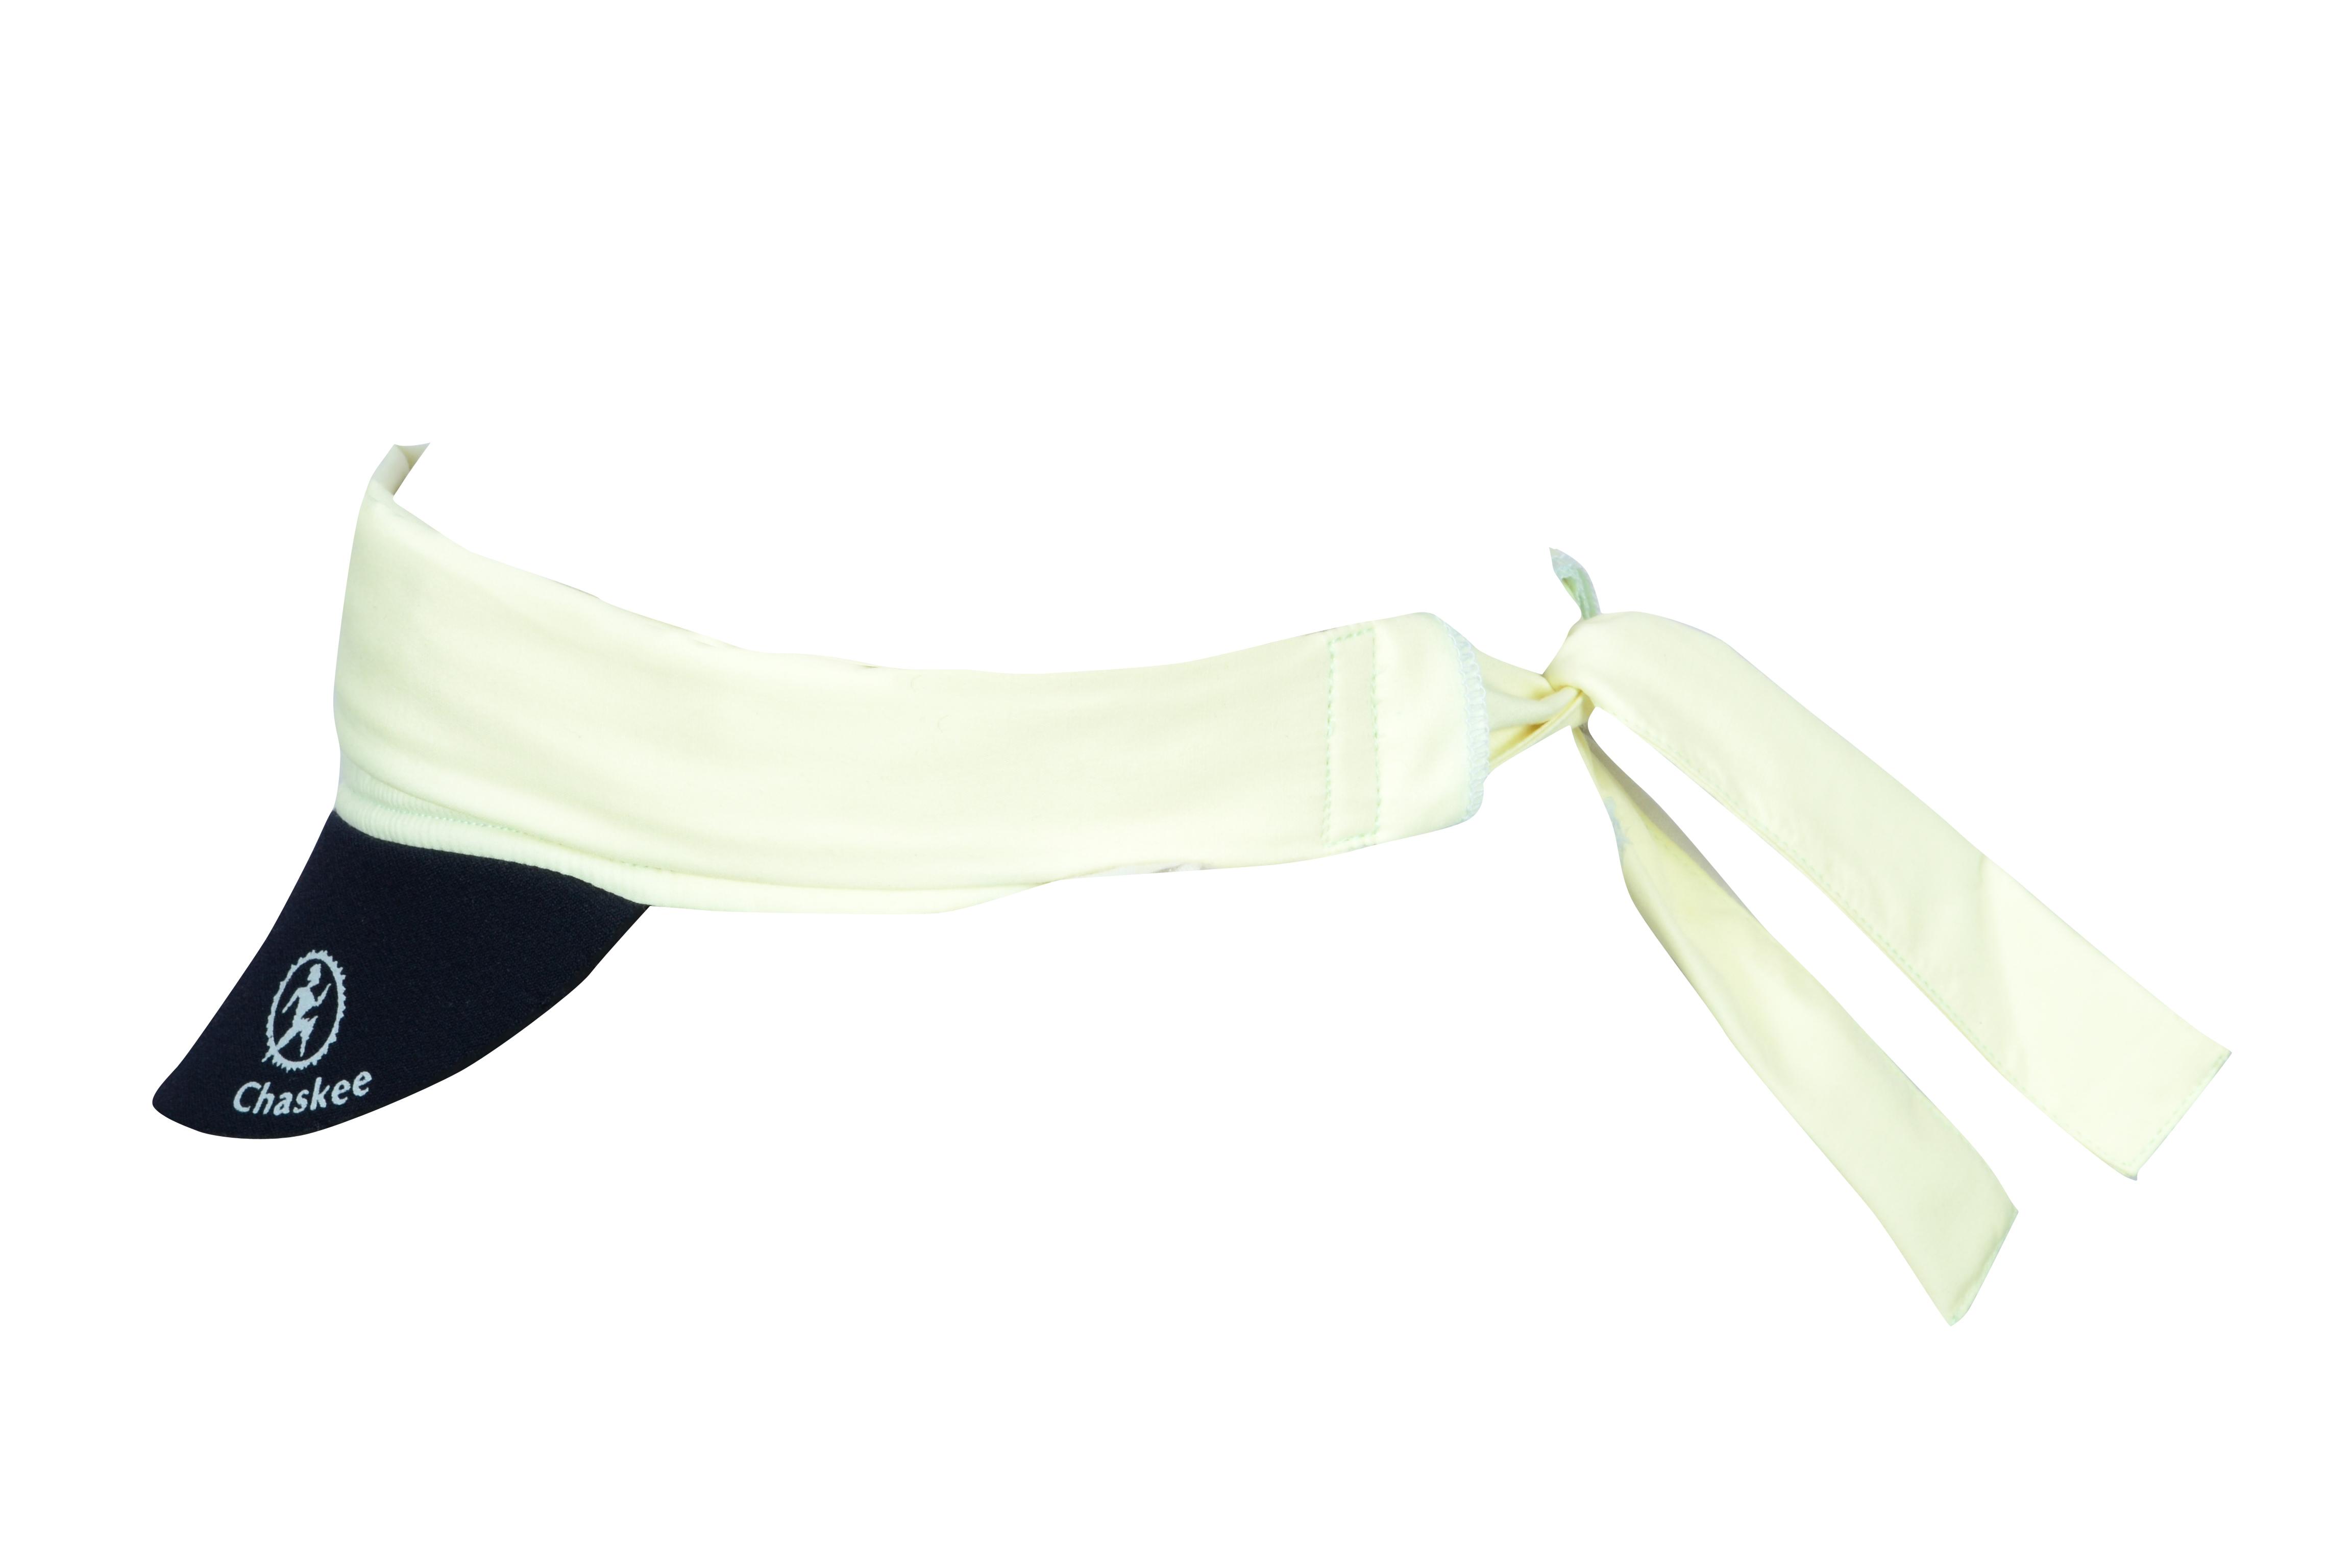 Chaskee Visor Snap Cap Microfiber Plain